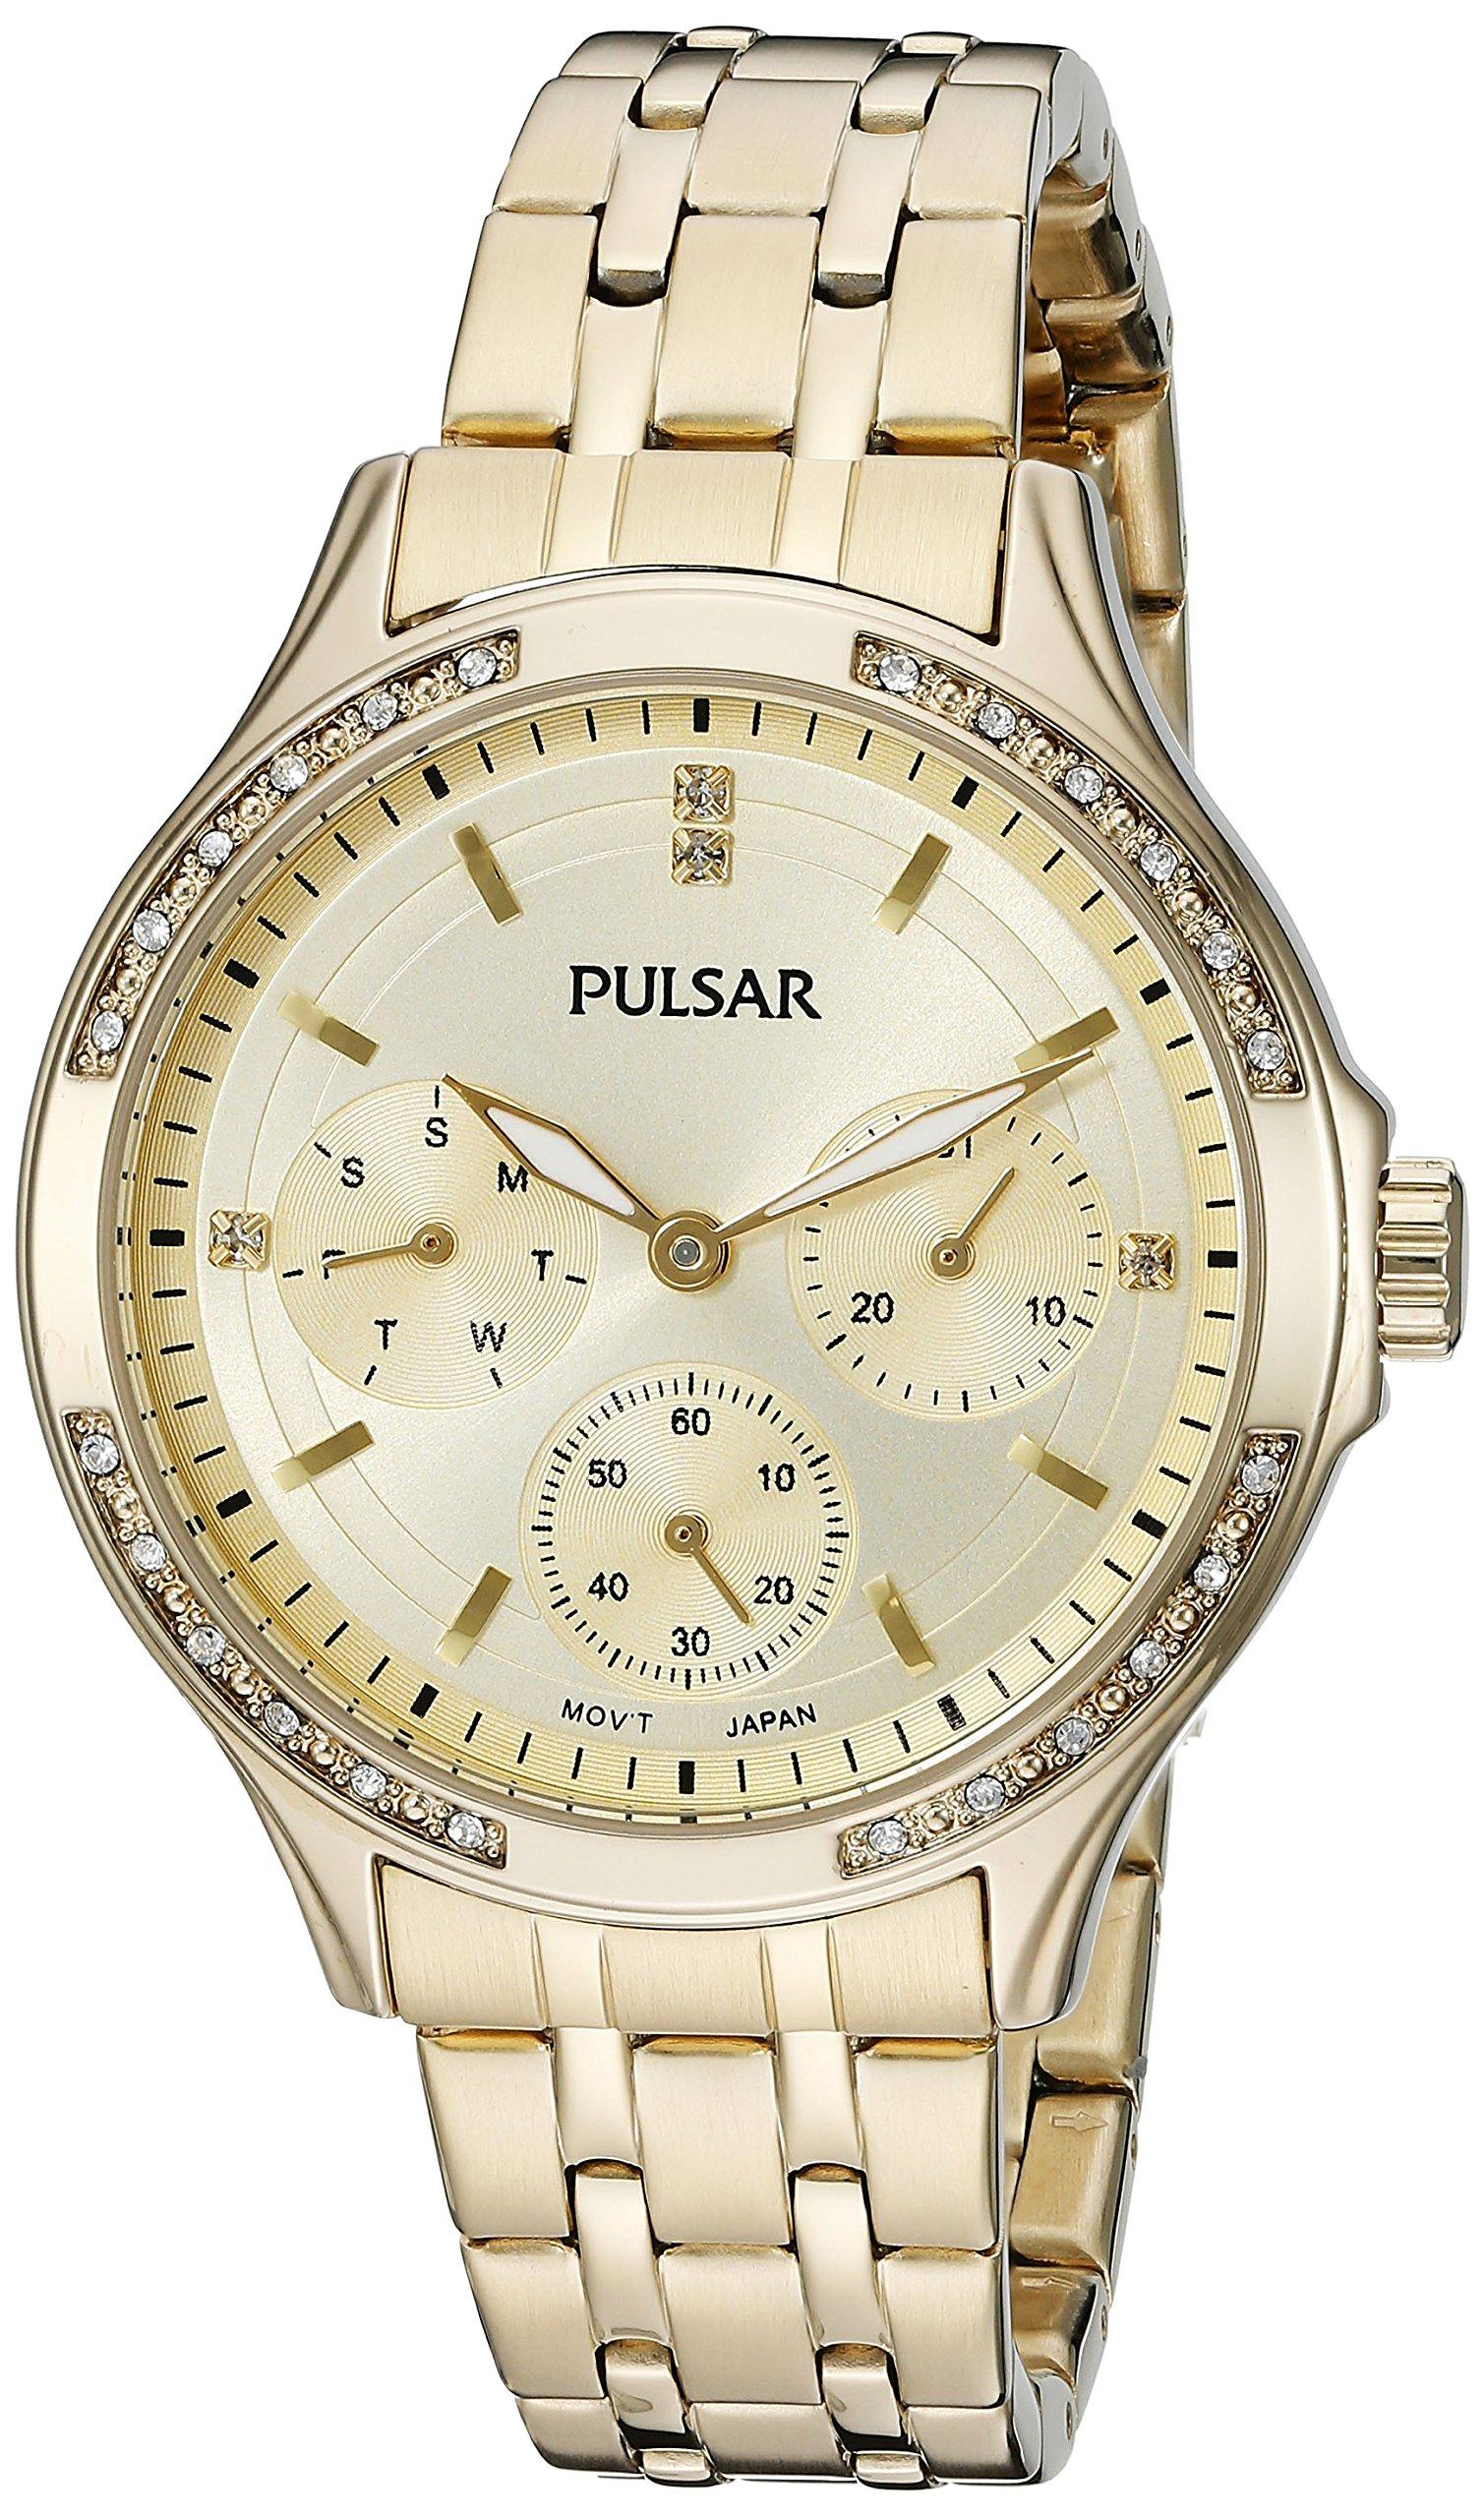 Pulsar Women's PP6190 Chronograph Analog Display Japanese Quartz Gold Watch